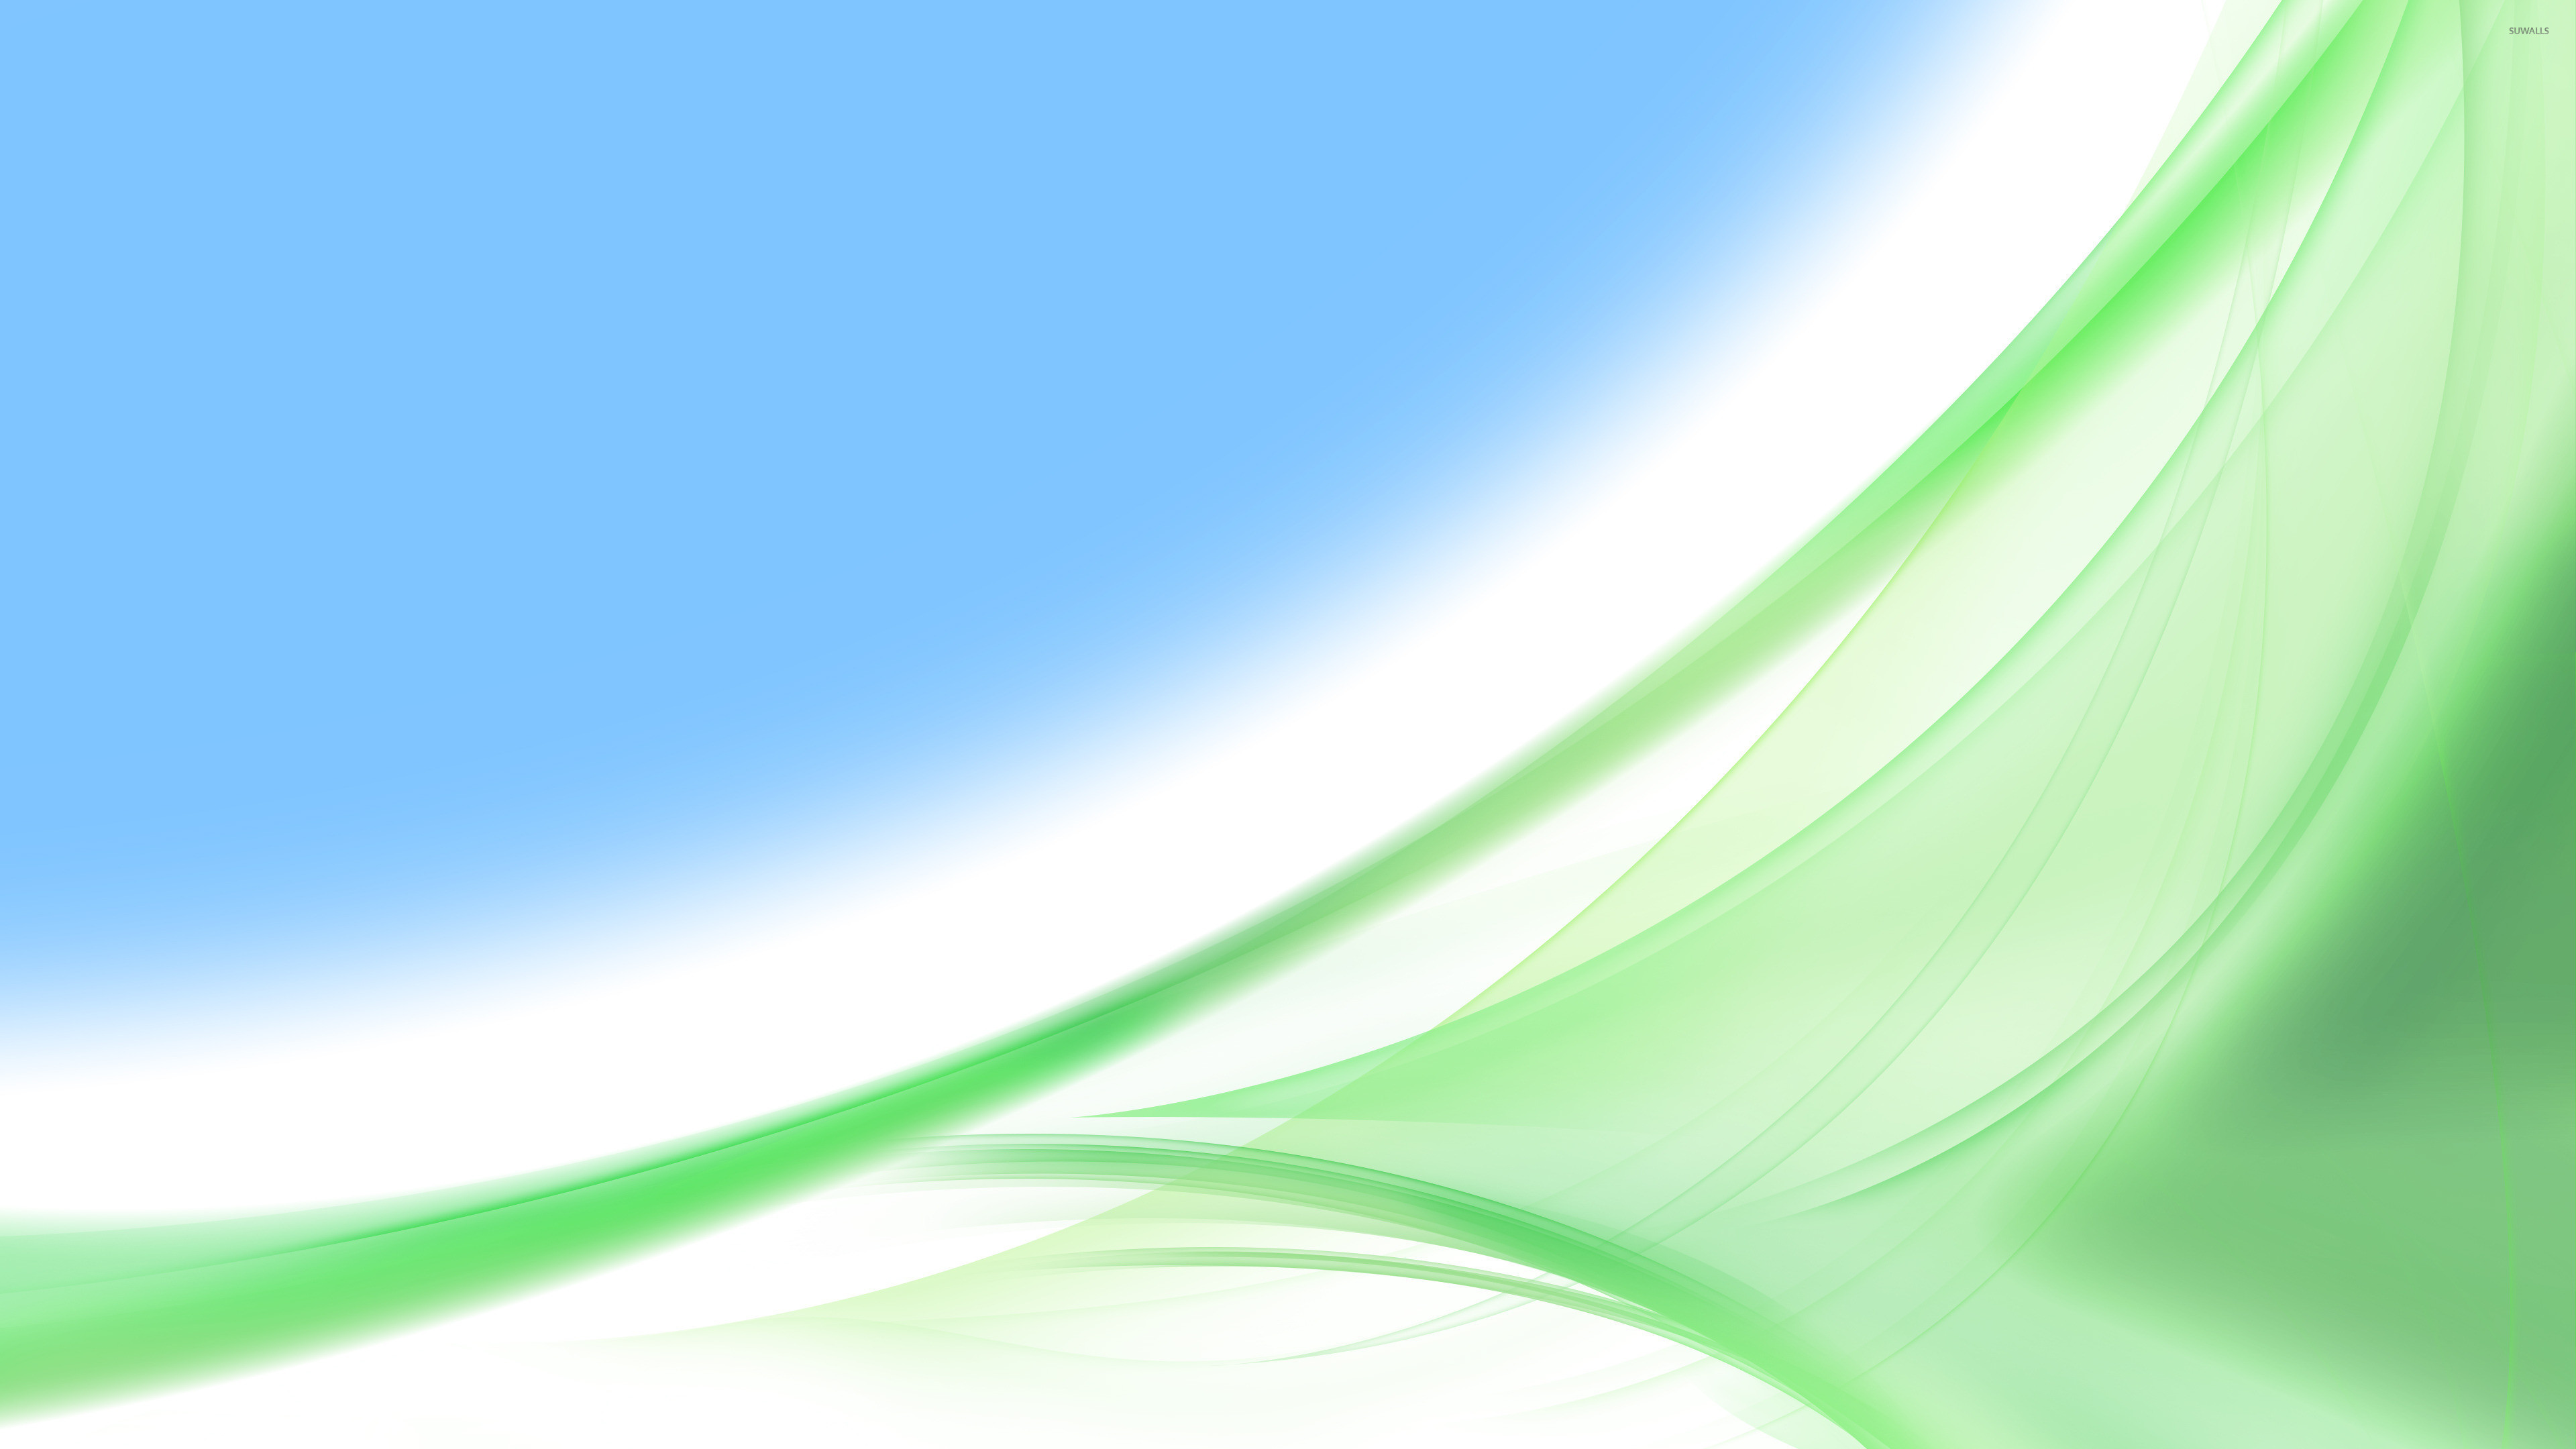 Abstract Green Wallpaper ·① WallpaperTagGreen Abstract Wallpaper